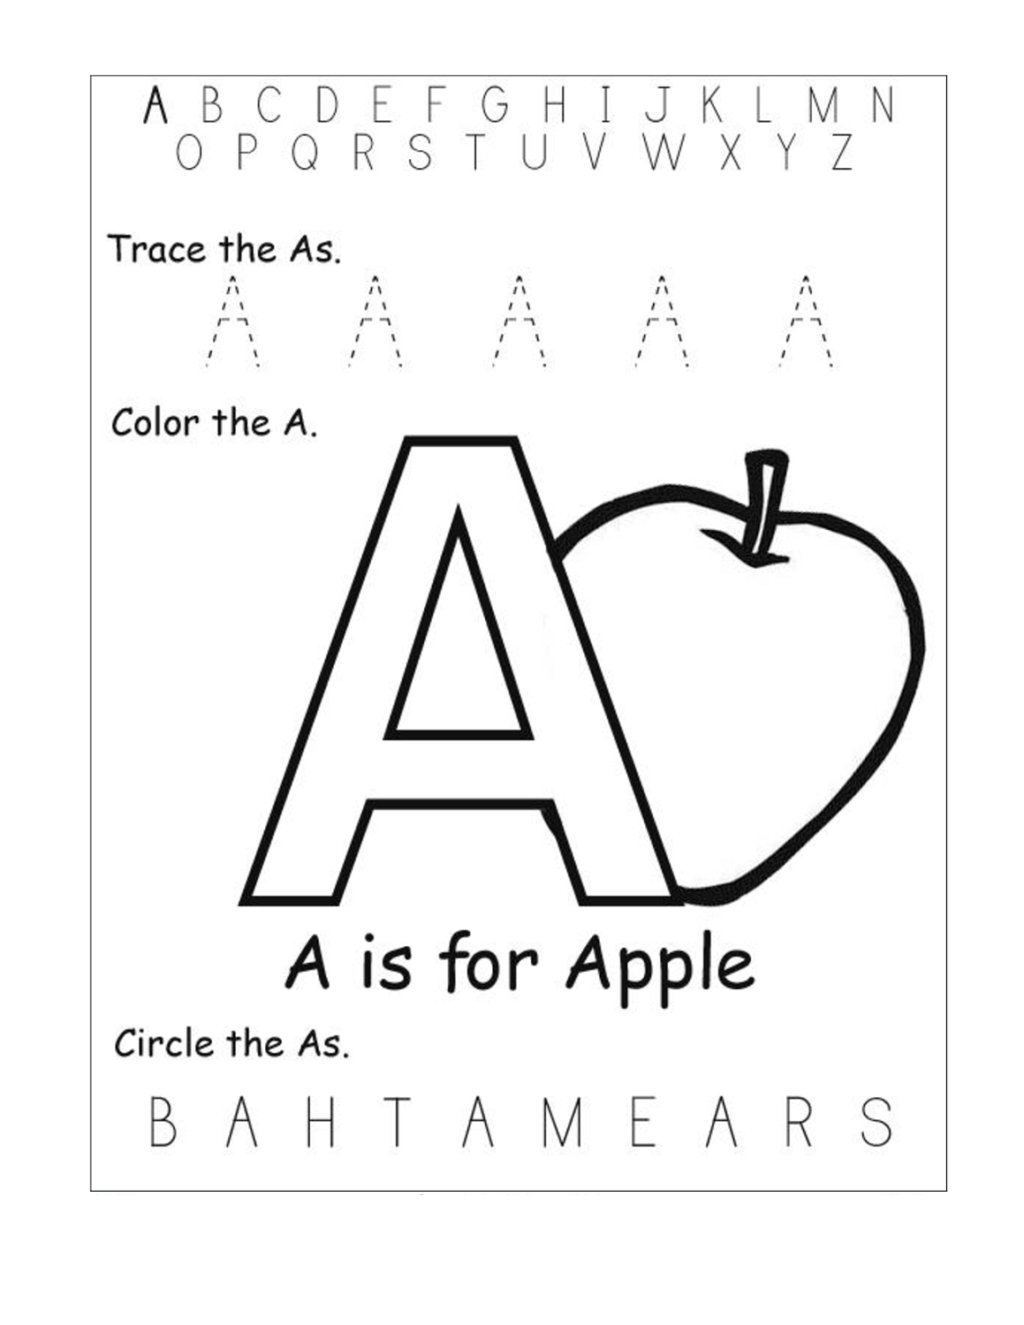 50 Marvelous Alphabet Worksheets Kindergarten Photo Ideas with Letter I Worksheets For Toddlers